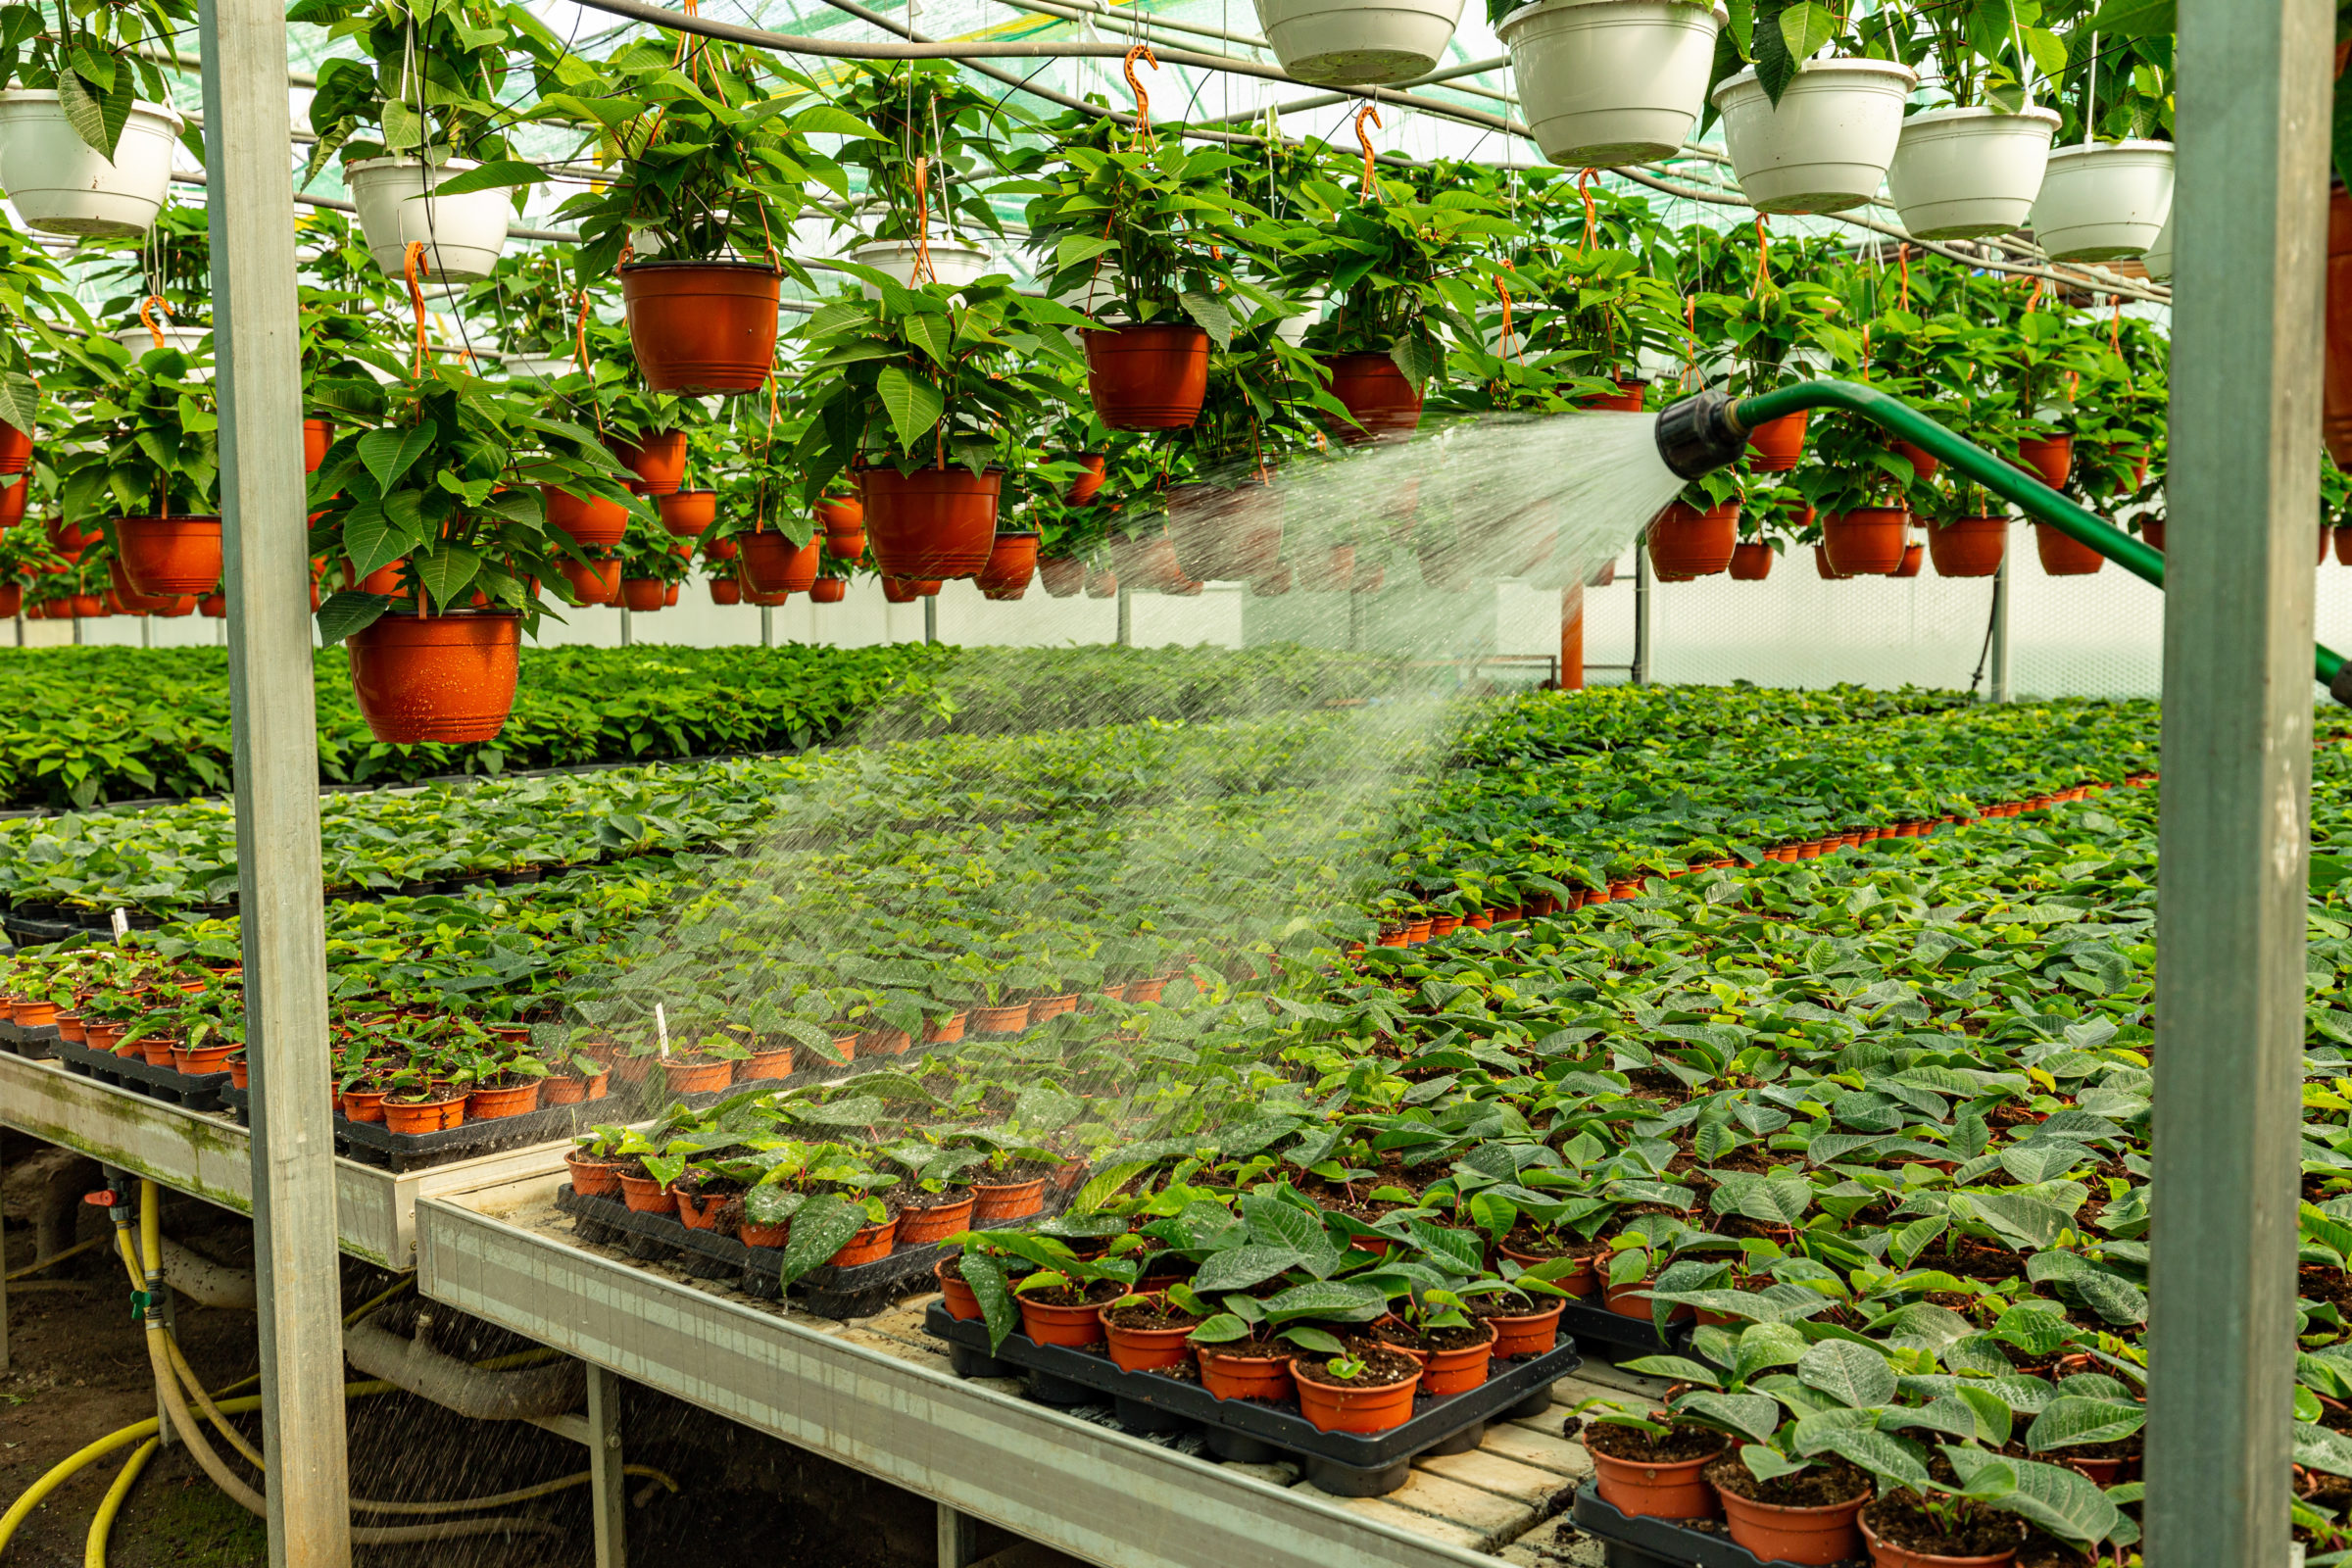 watering plants with garden hose XB9PXWB